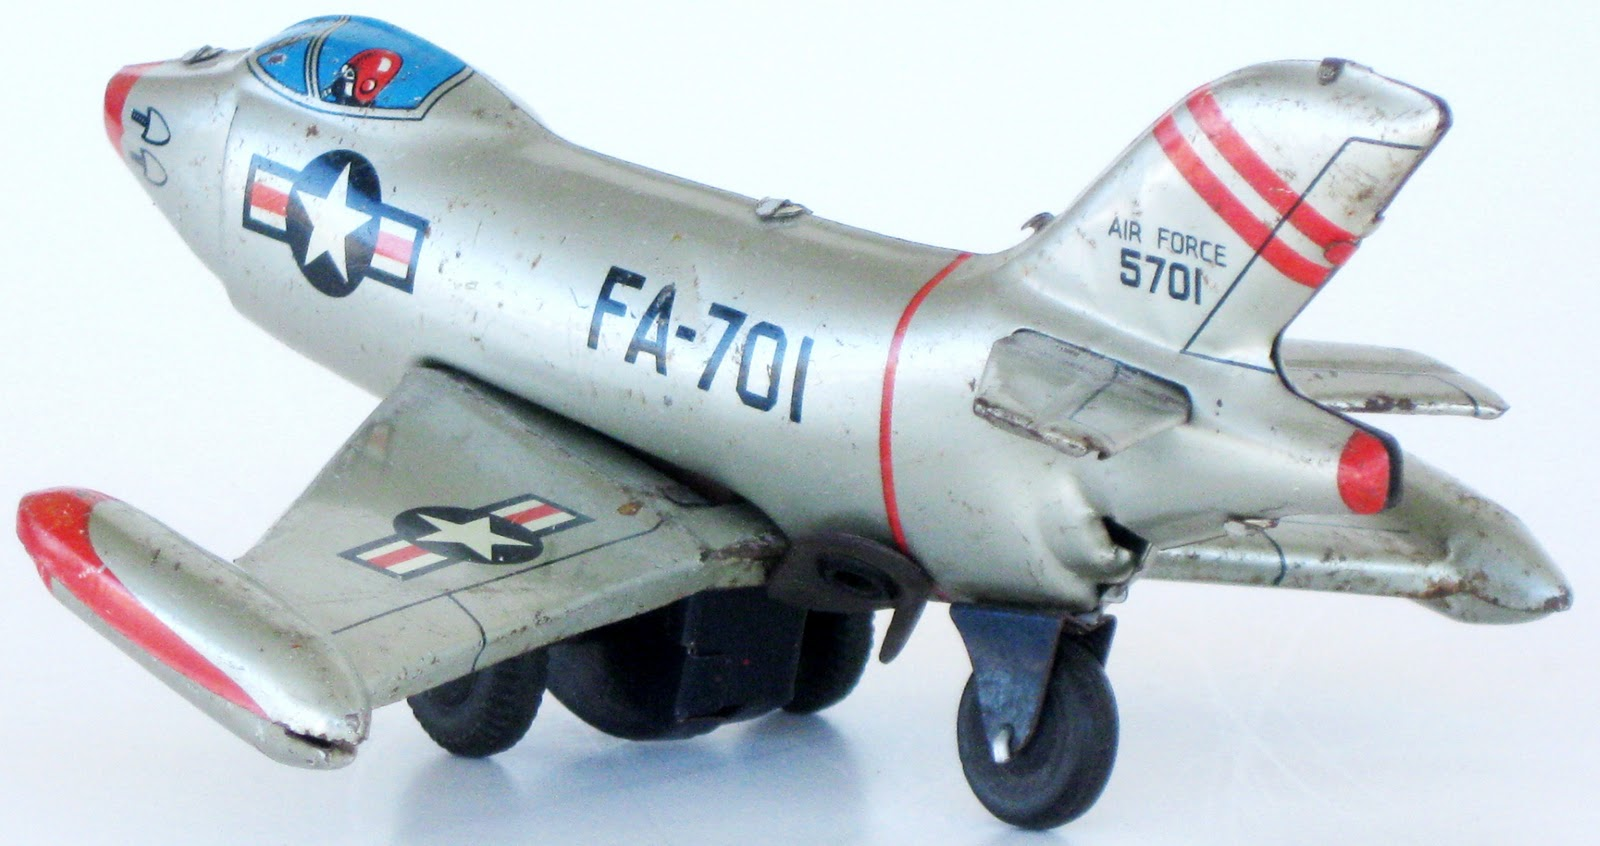 http://3.bp.blogspot.com/-1pAdj6j7Rmw/TxH7RY669iI/AAAAAAAAGyw/IDlmaPHdln4/s1600/Linemar+5th+AF+F-86+Sabre+29.JPG